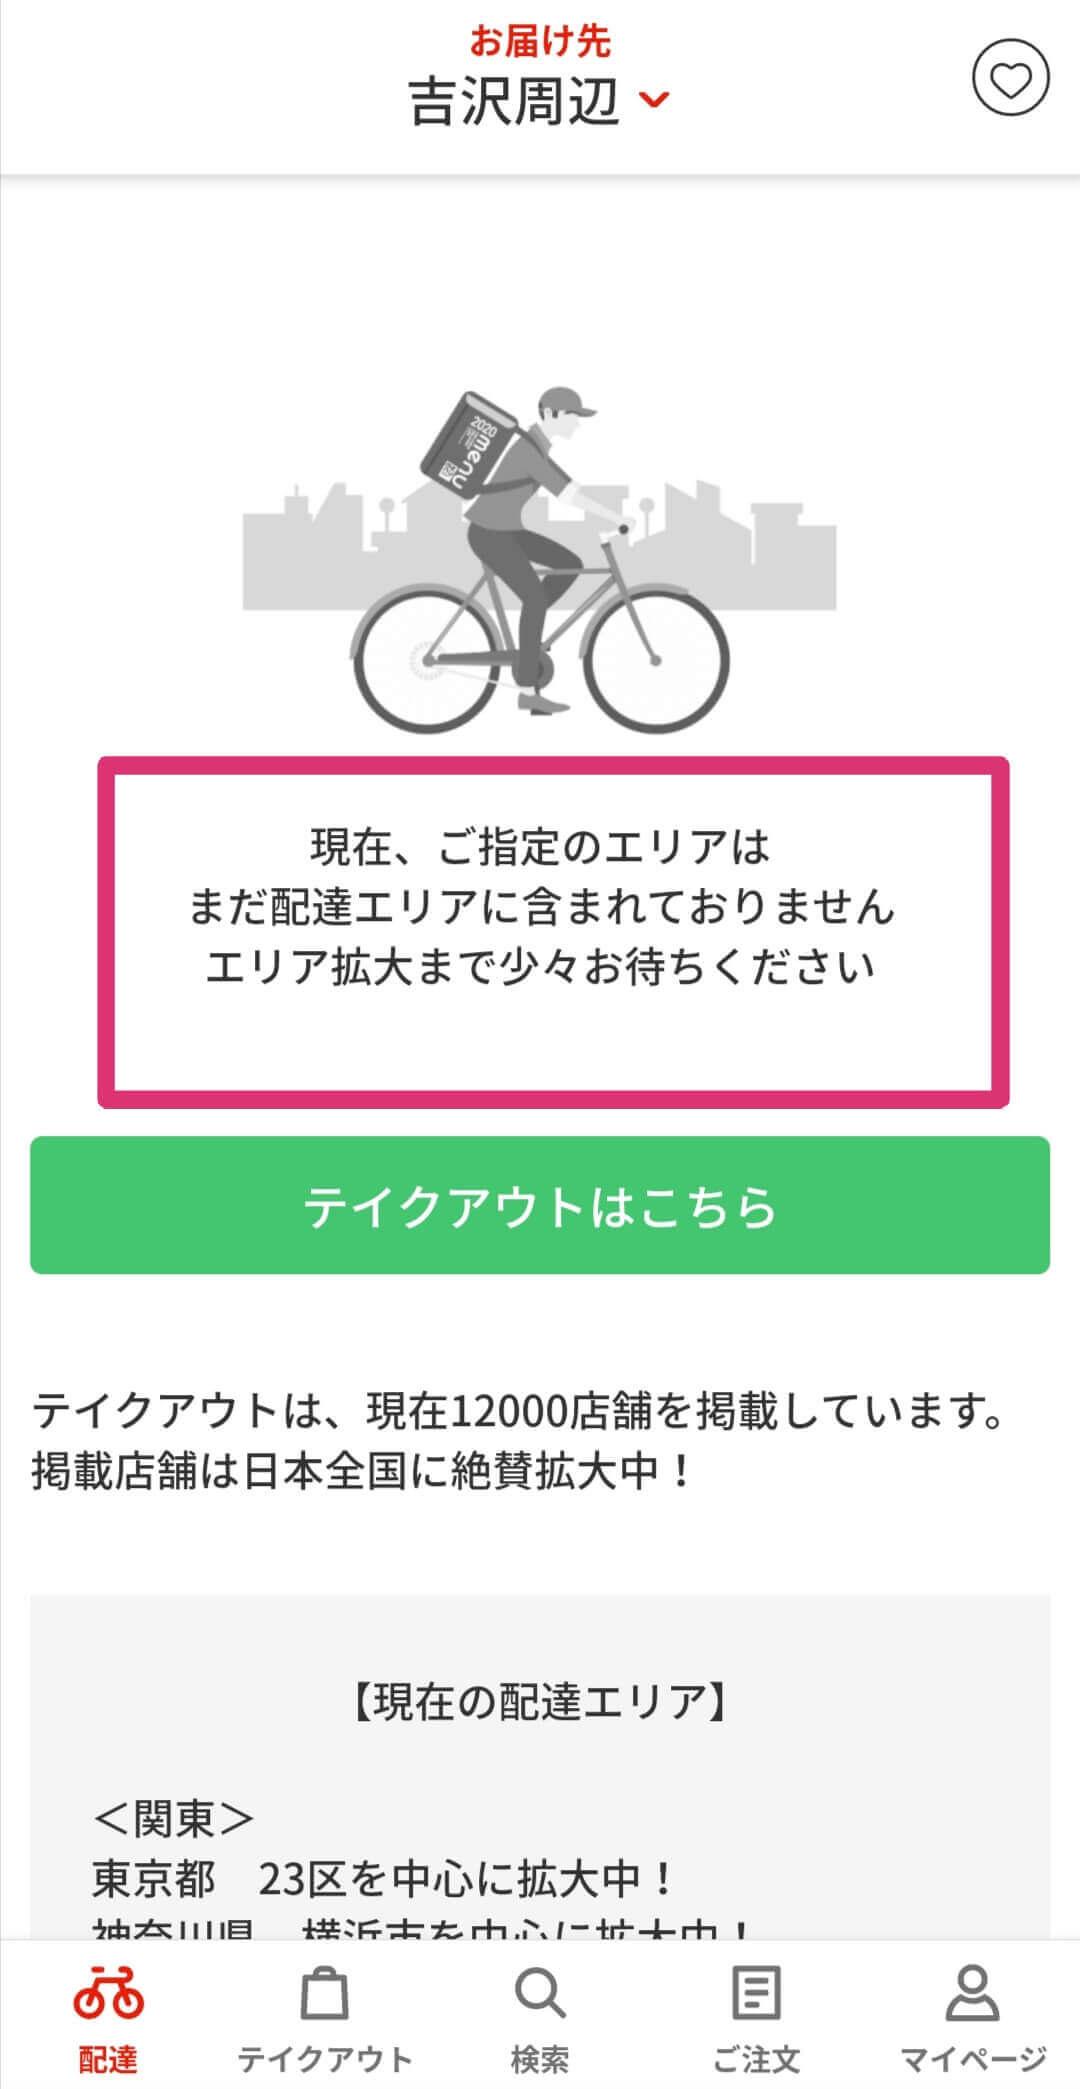 menu/メニュー東京エリア・配達対応地域の確認方法5お届け配達対応外